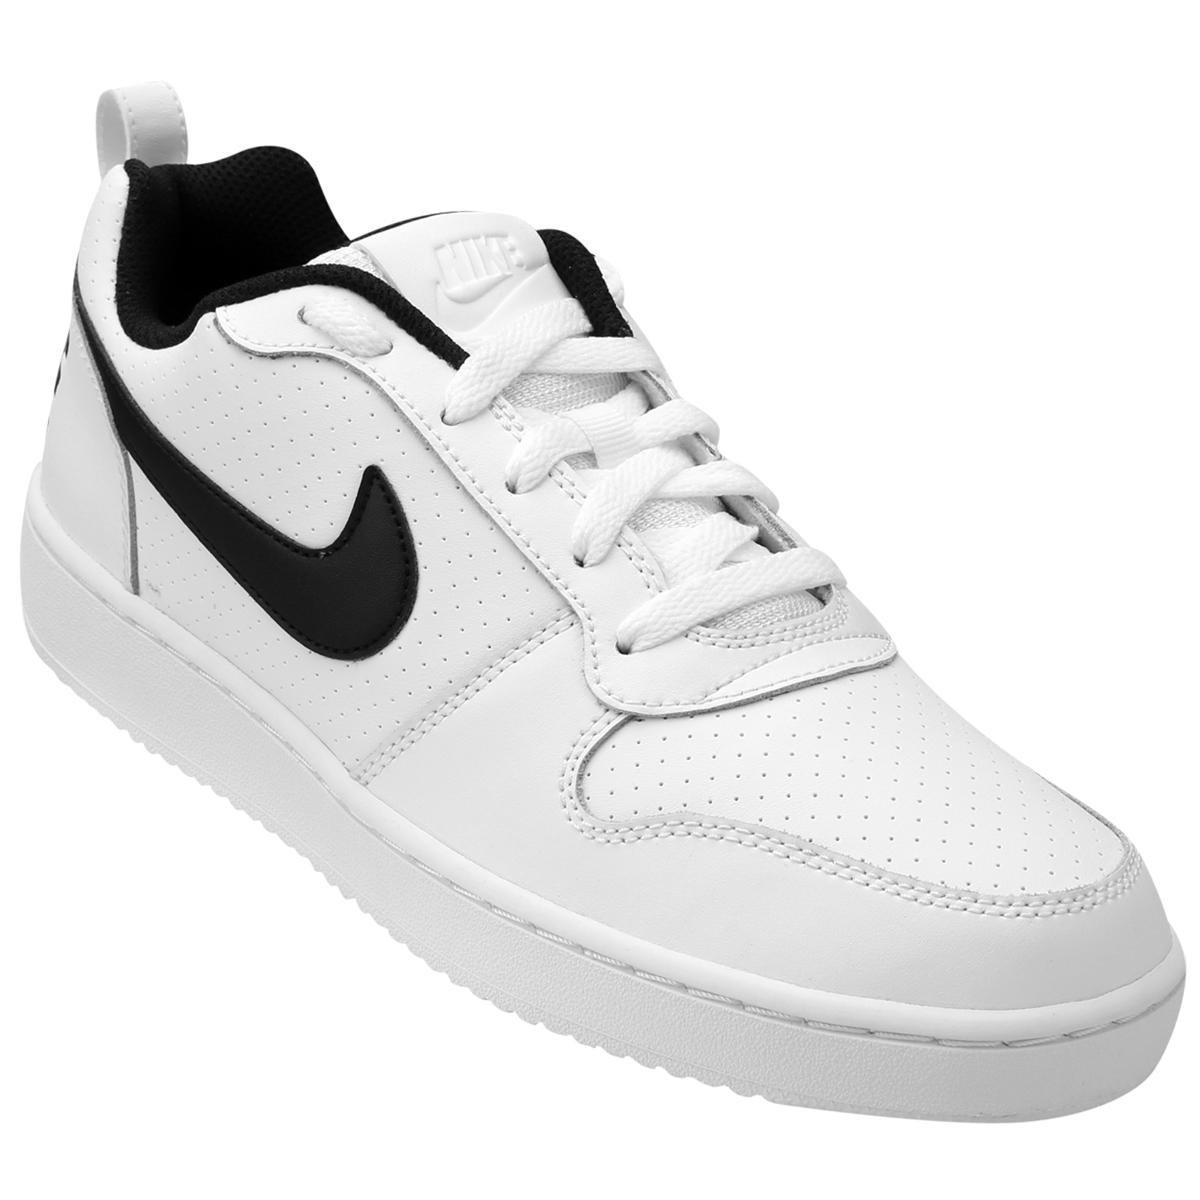 425fef2c4ce Tênis Nike Recreation Low Masculino - Compre Agora